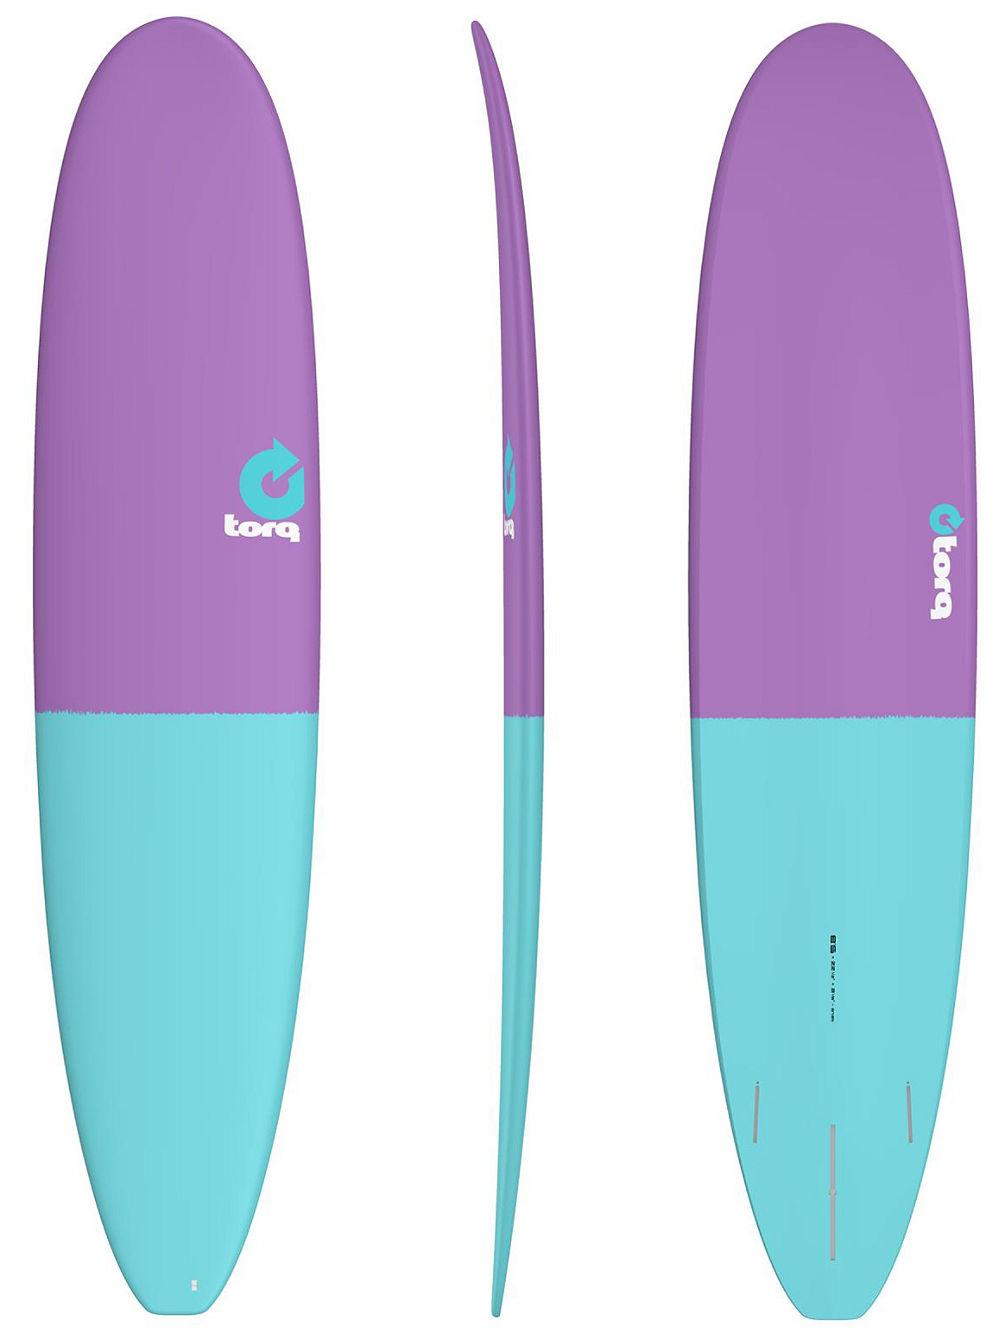 Compra torq tet 8 6 longboard tavola da surf online su - Misure tavole da surf ...